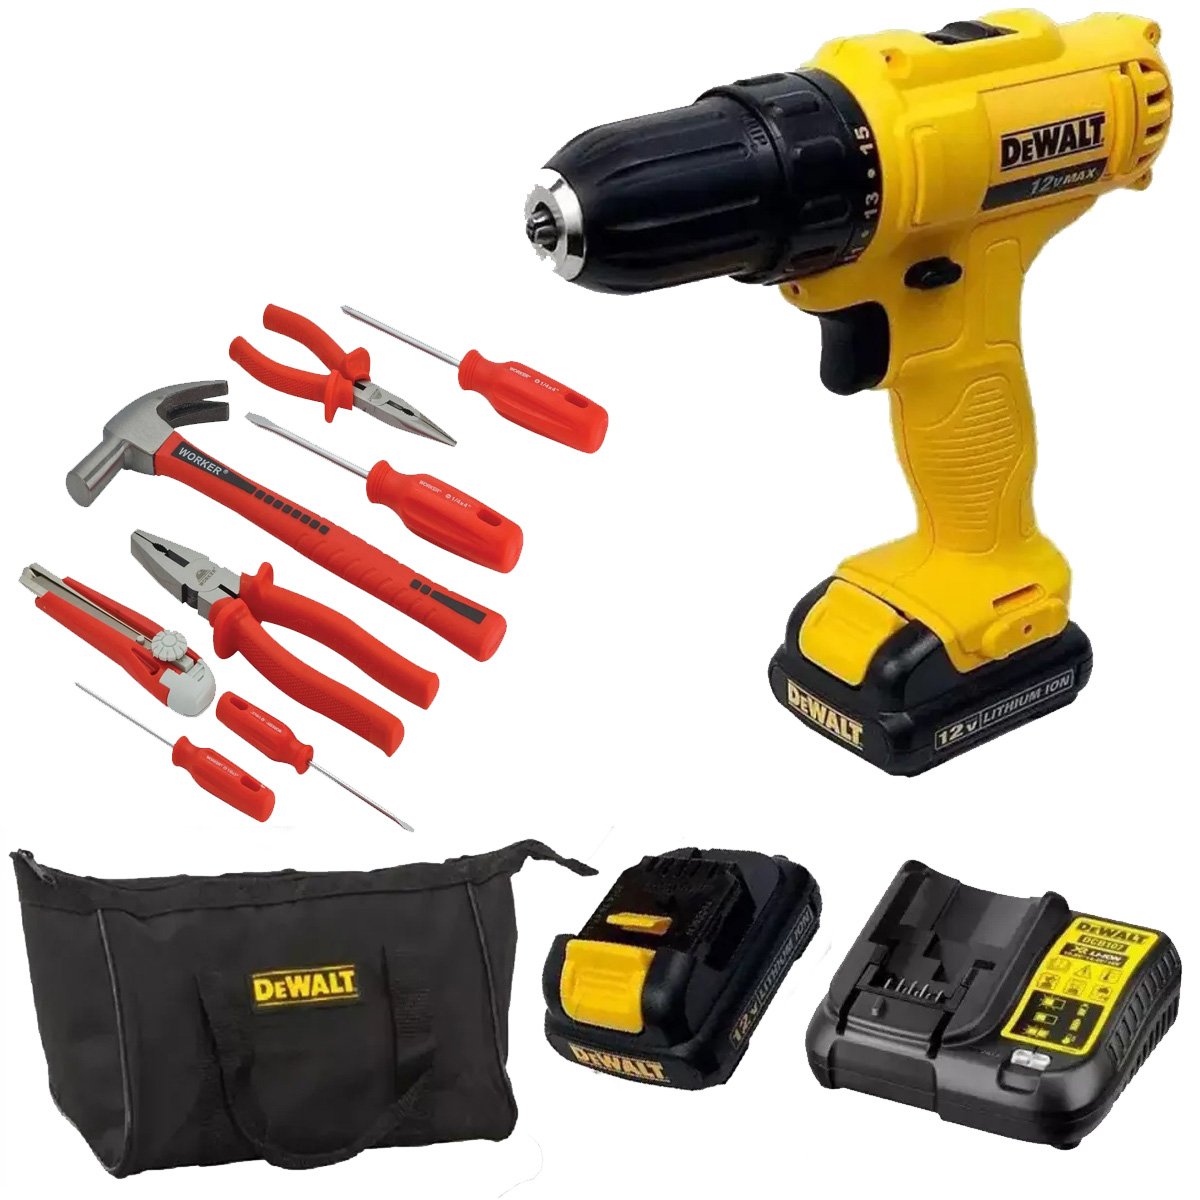 Parafusadeira Furadeira 2 Baterias Dewalt + Kit Ferramentas Worker